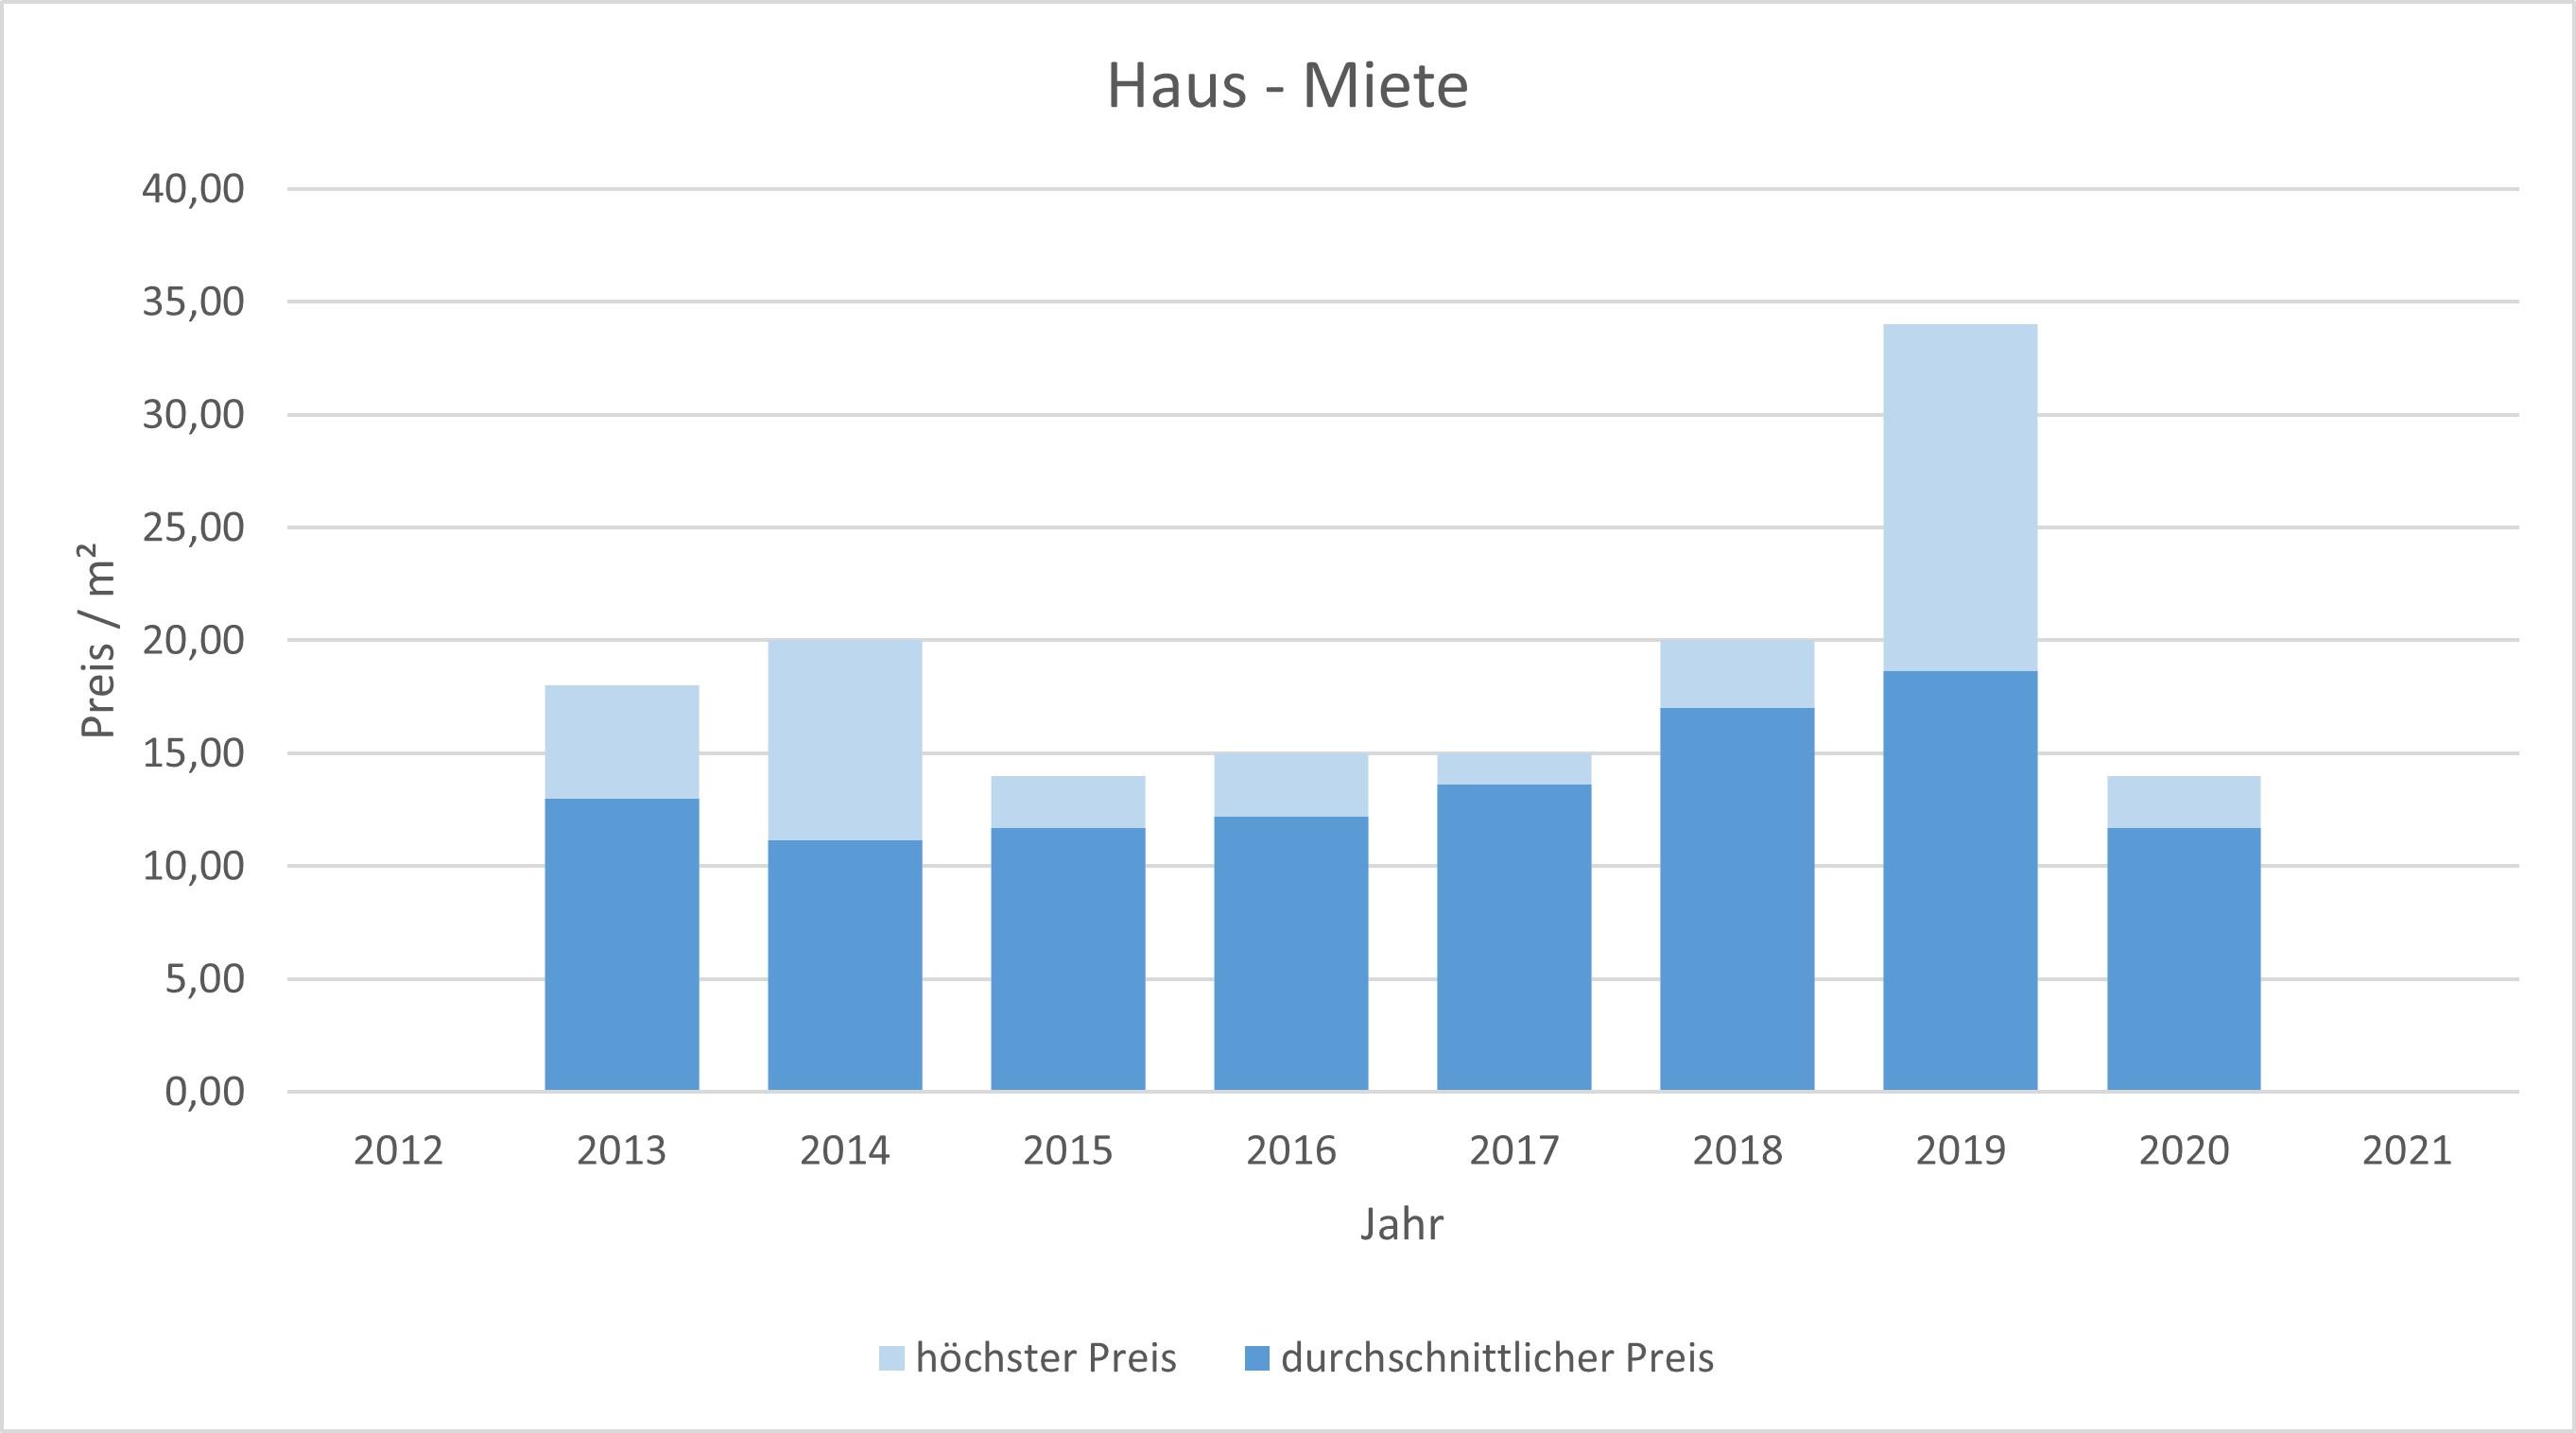 Tegernsee Haus mieten vermieten Preis Bewertung Makler www.happy-immo.de 2019 2020 2021